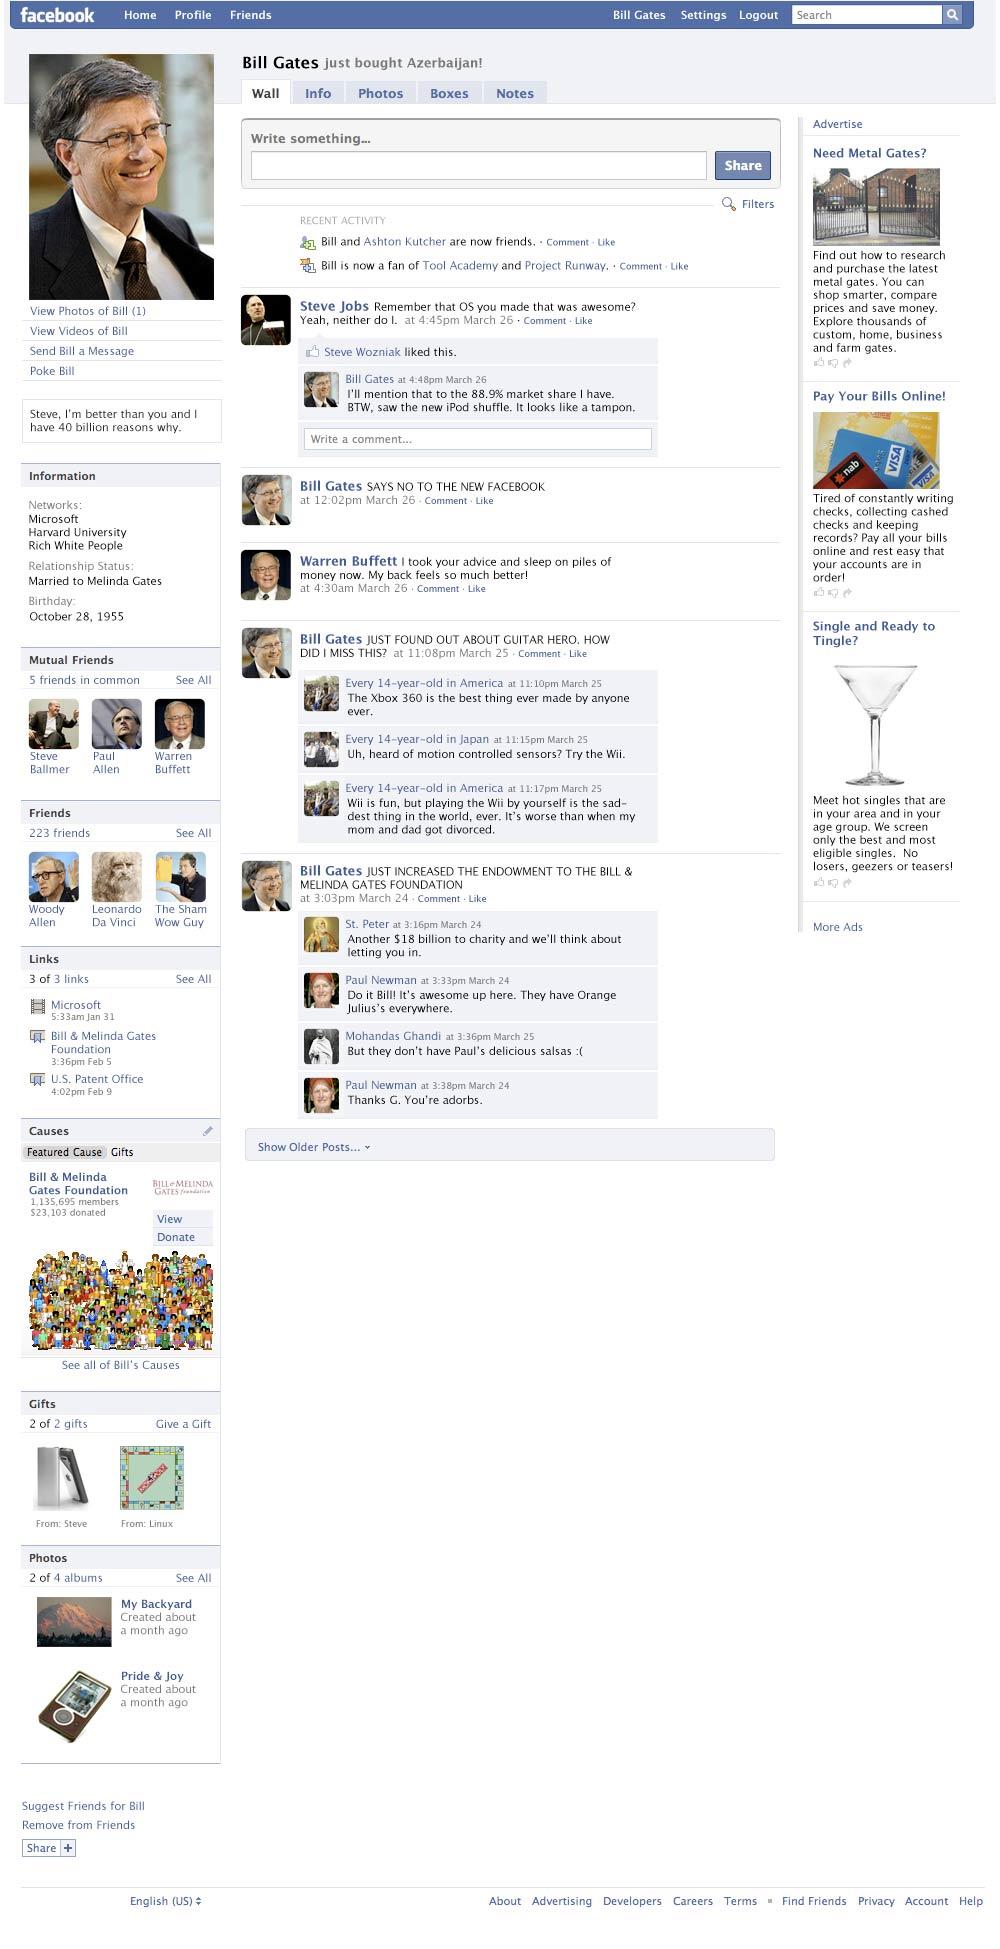 Bill Gates' Facebook Profile